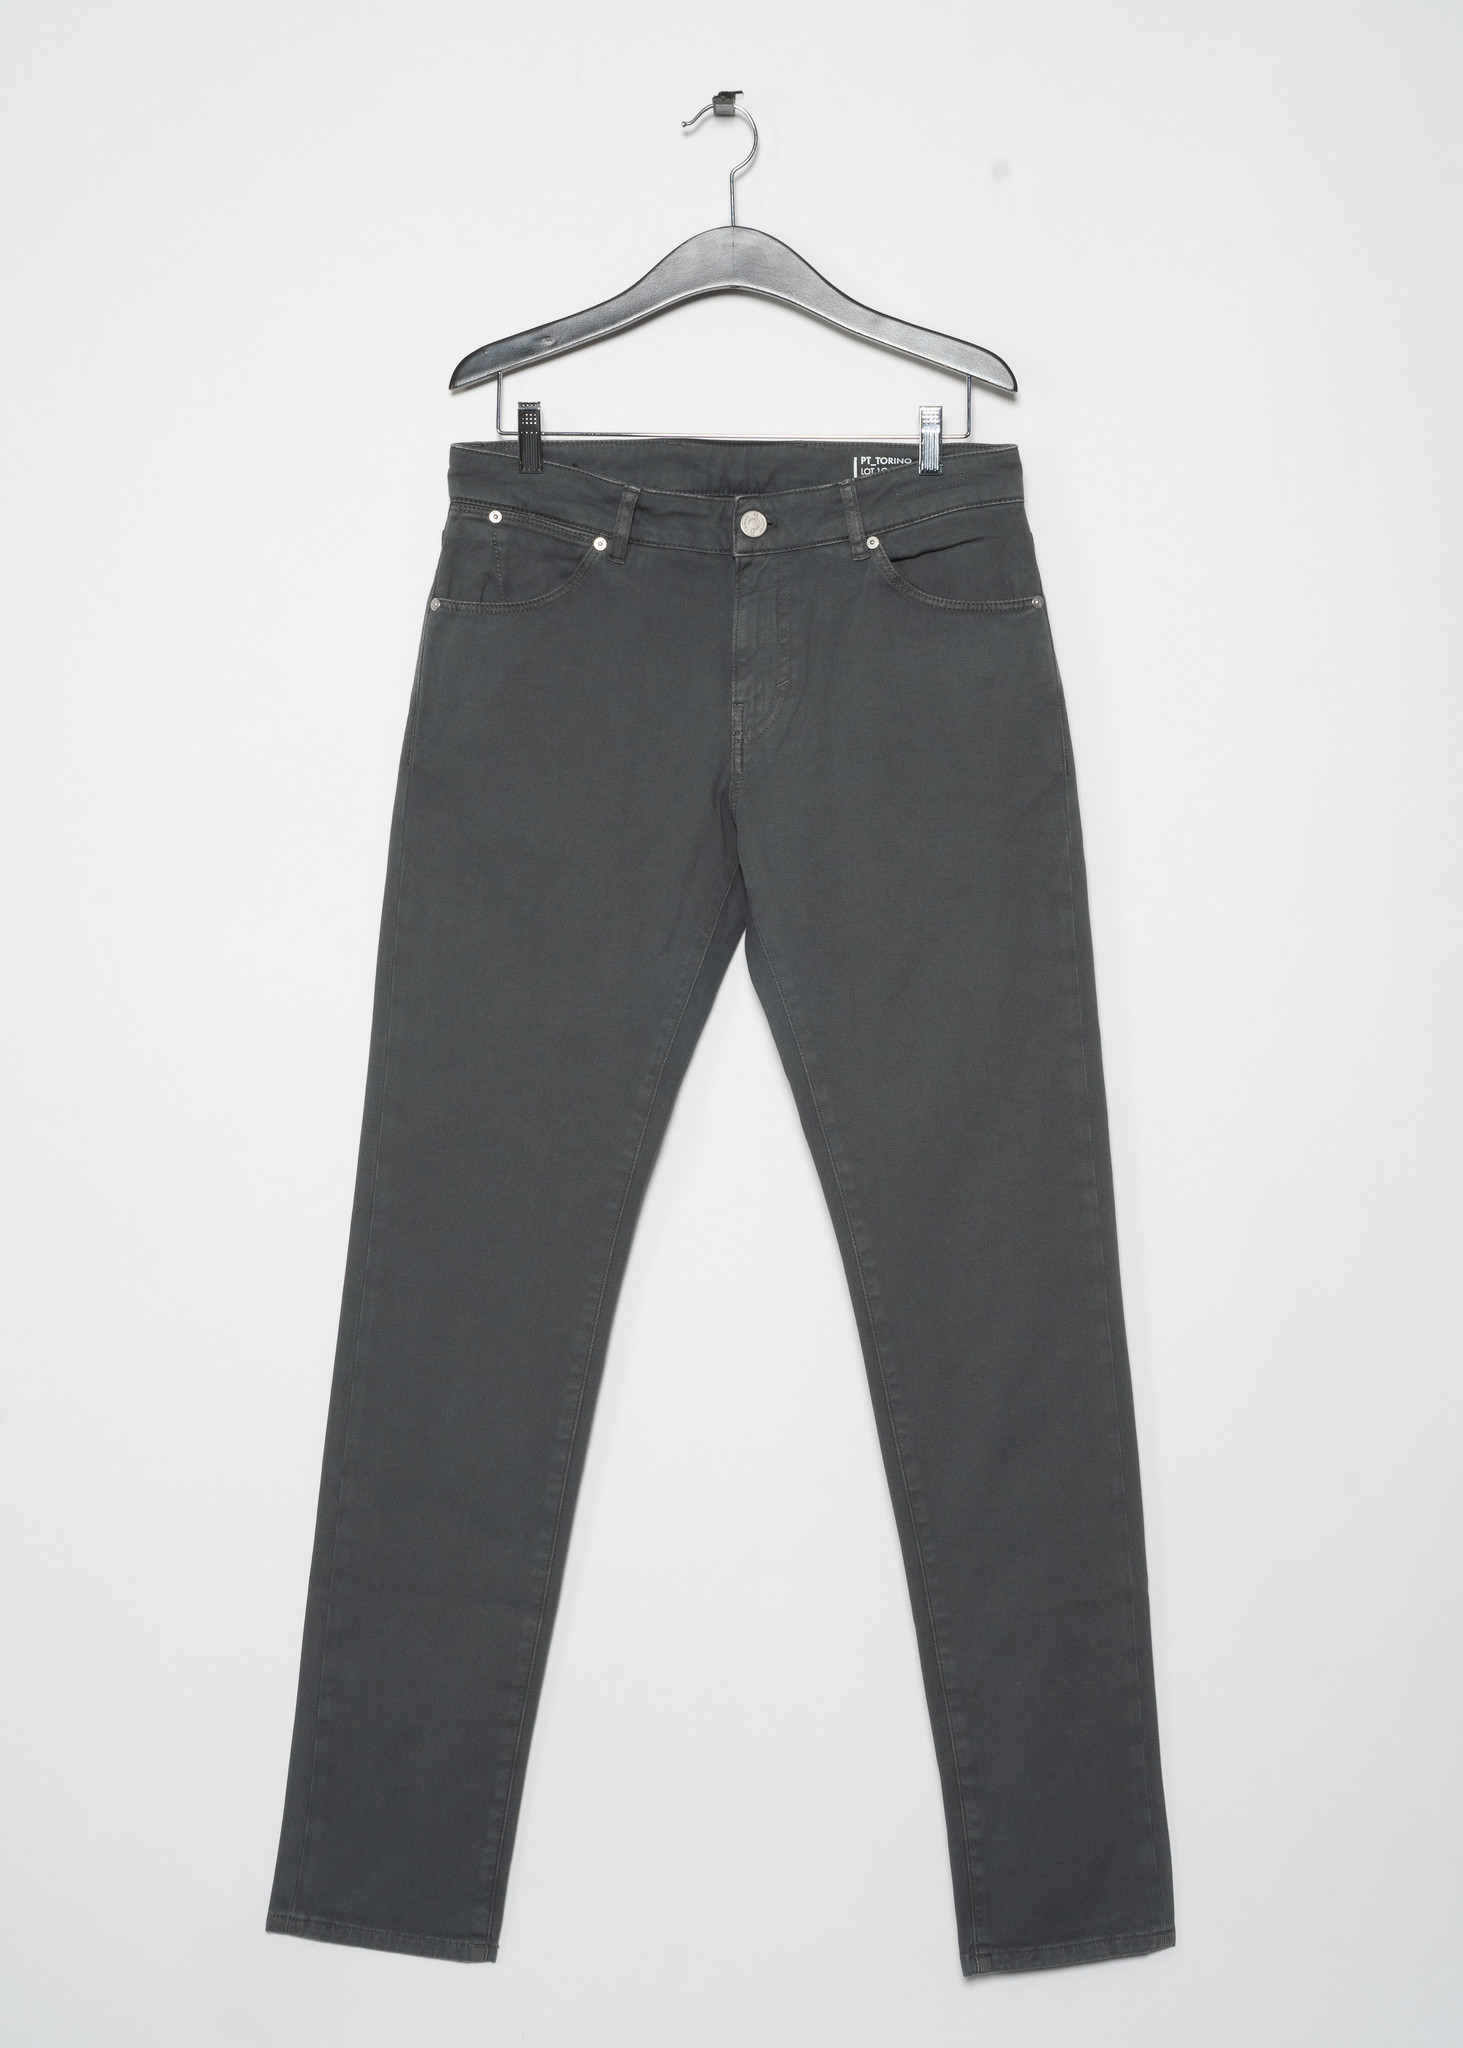 Grey TU59 Soul Jeans